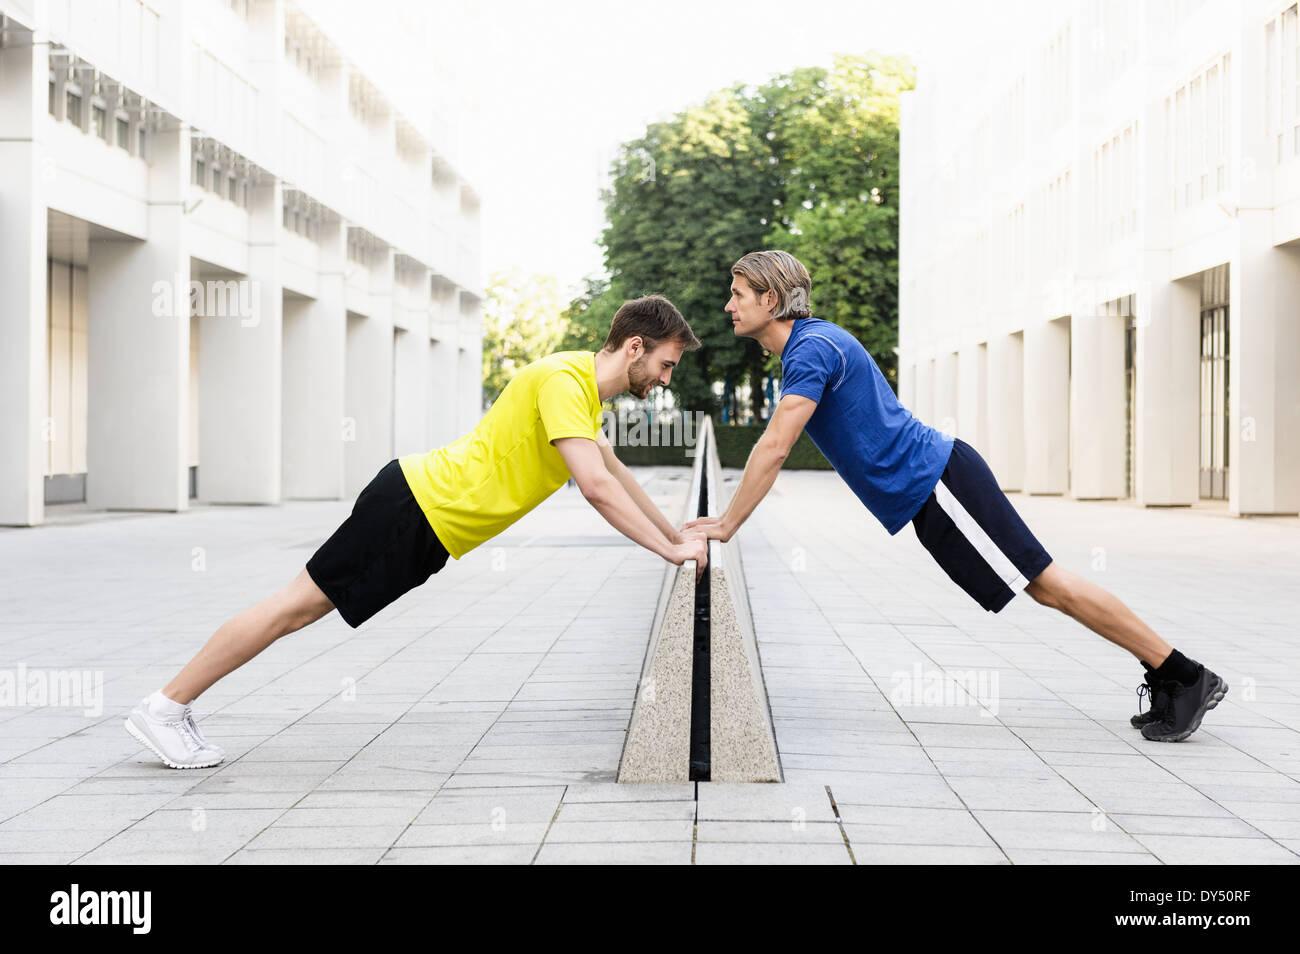 Men stretching on divider - Stock Image